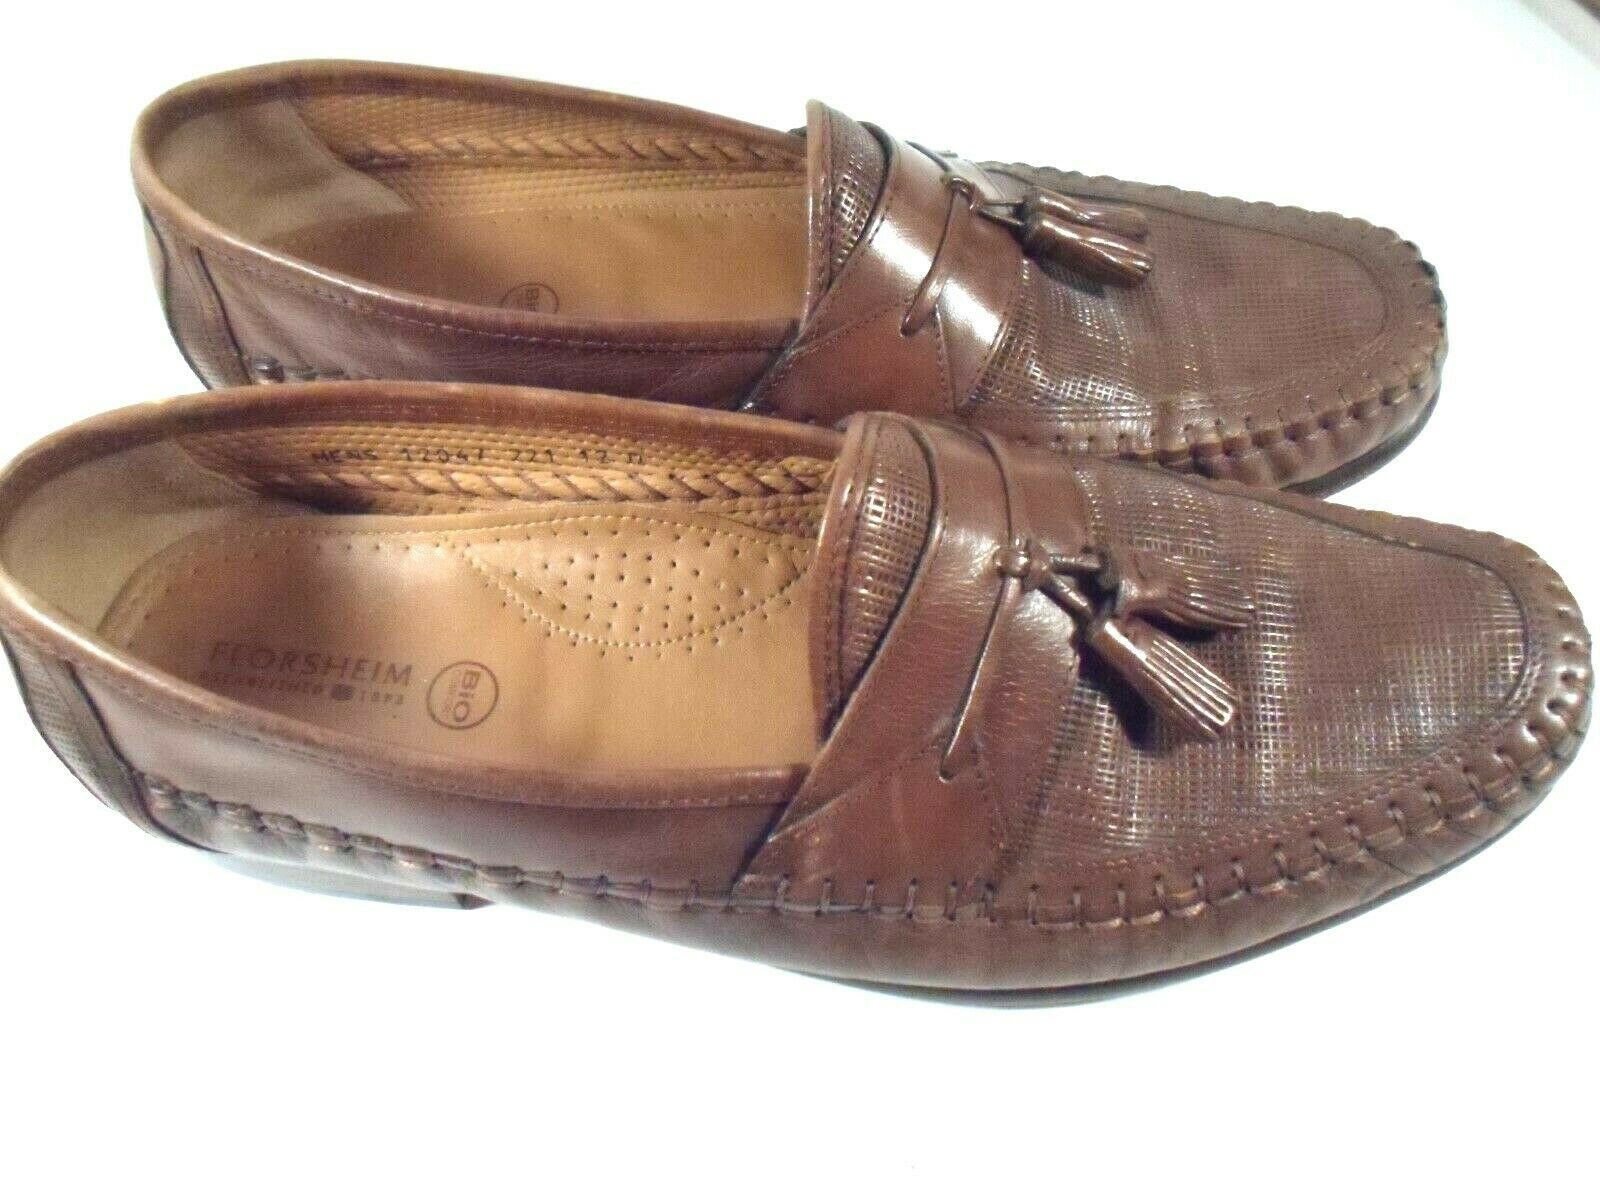 Florsheim bio comfort Sz 12 D Brown Leather Tassel Loafers